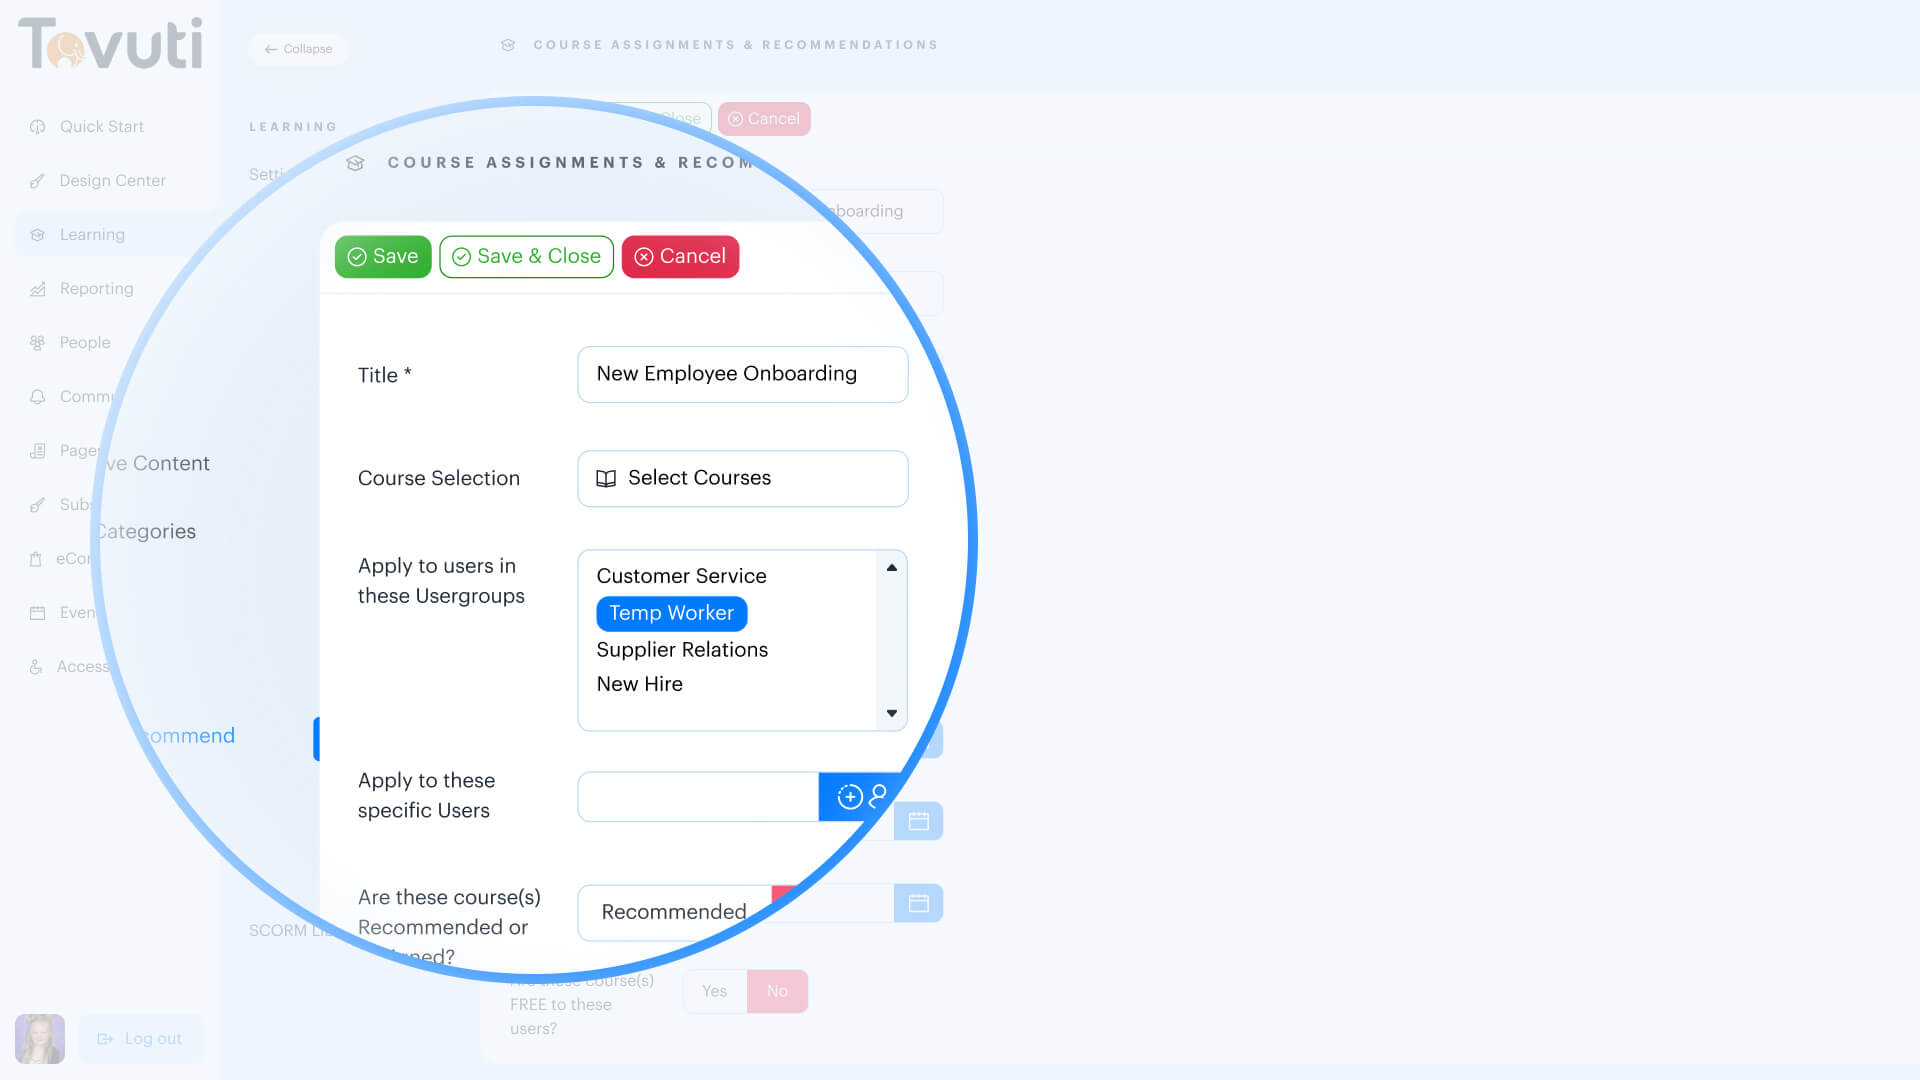 Tovuti LMS Dashboard Screenshot